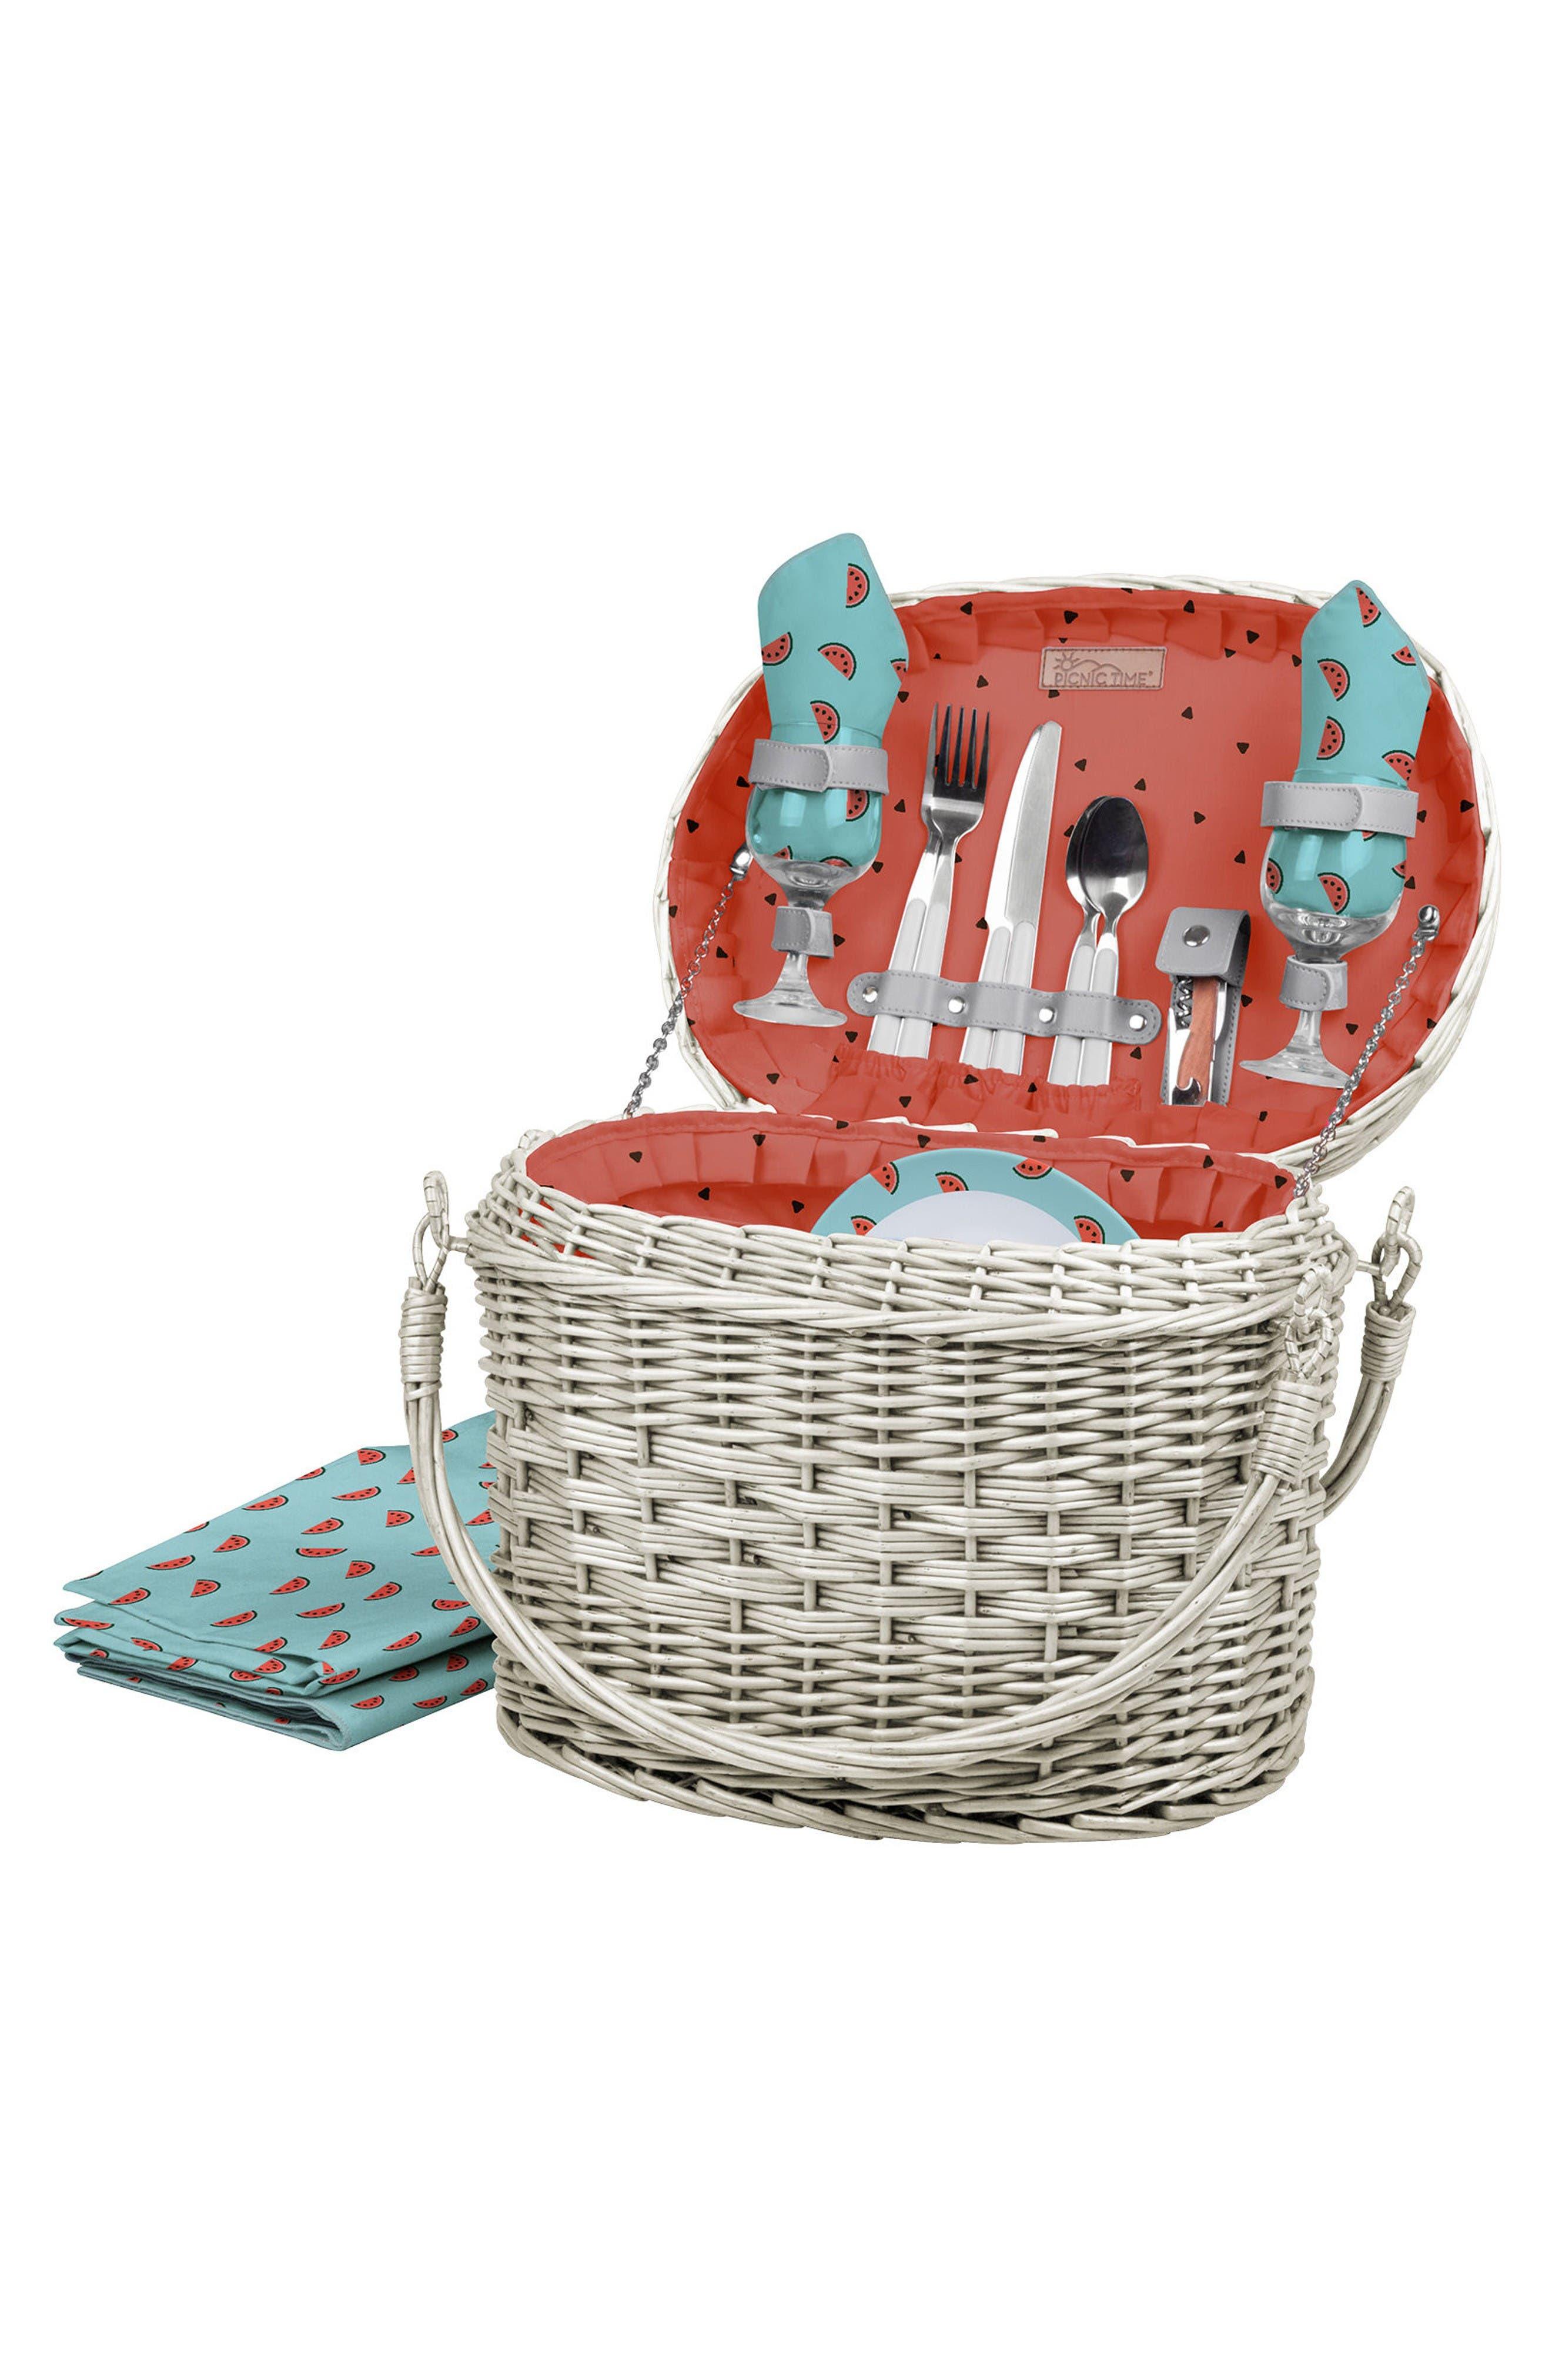 Romance Picnic Basket,                             Main thumbnail 1, color,                             Blue